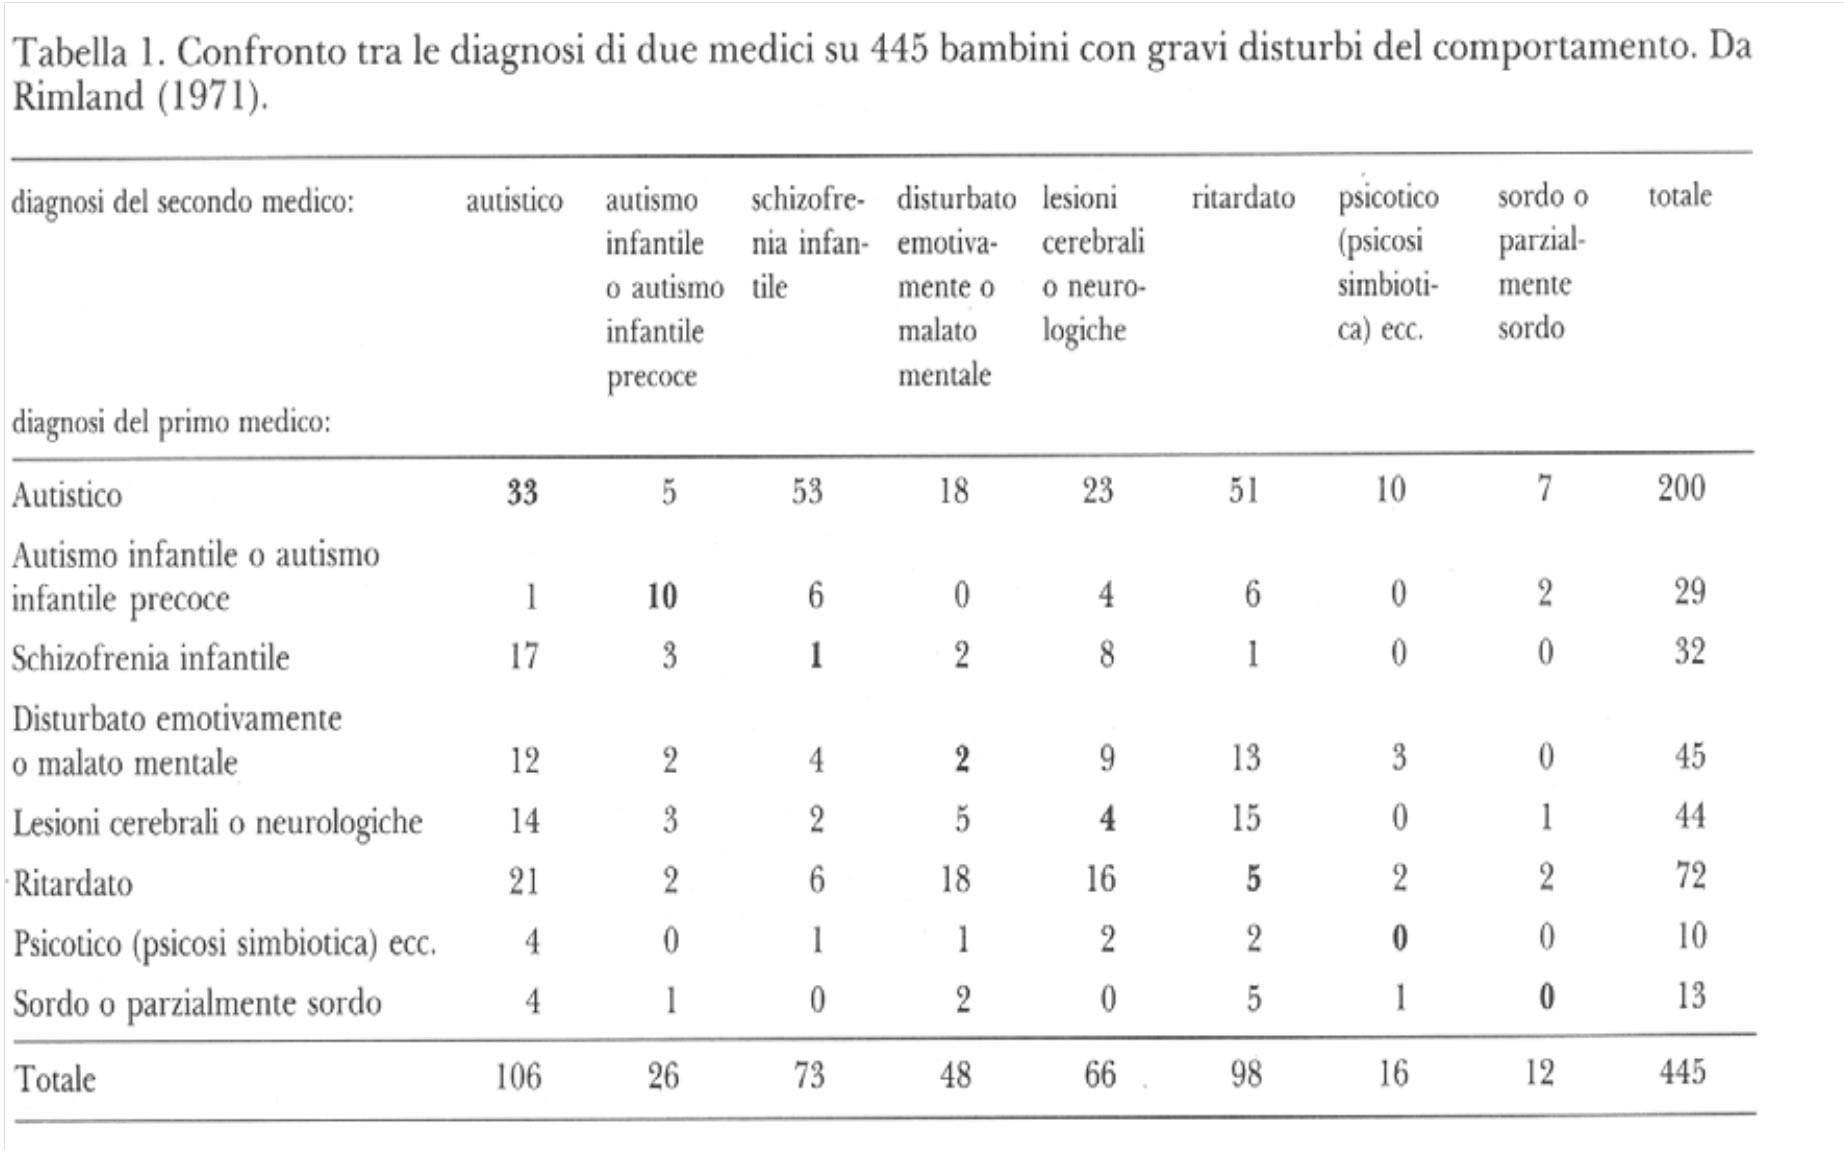 Diagnosi a confronto - 1971